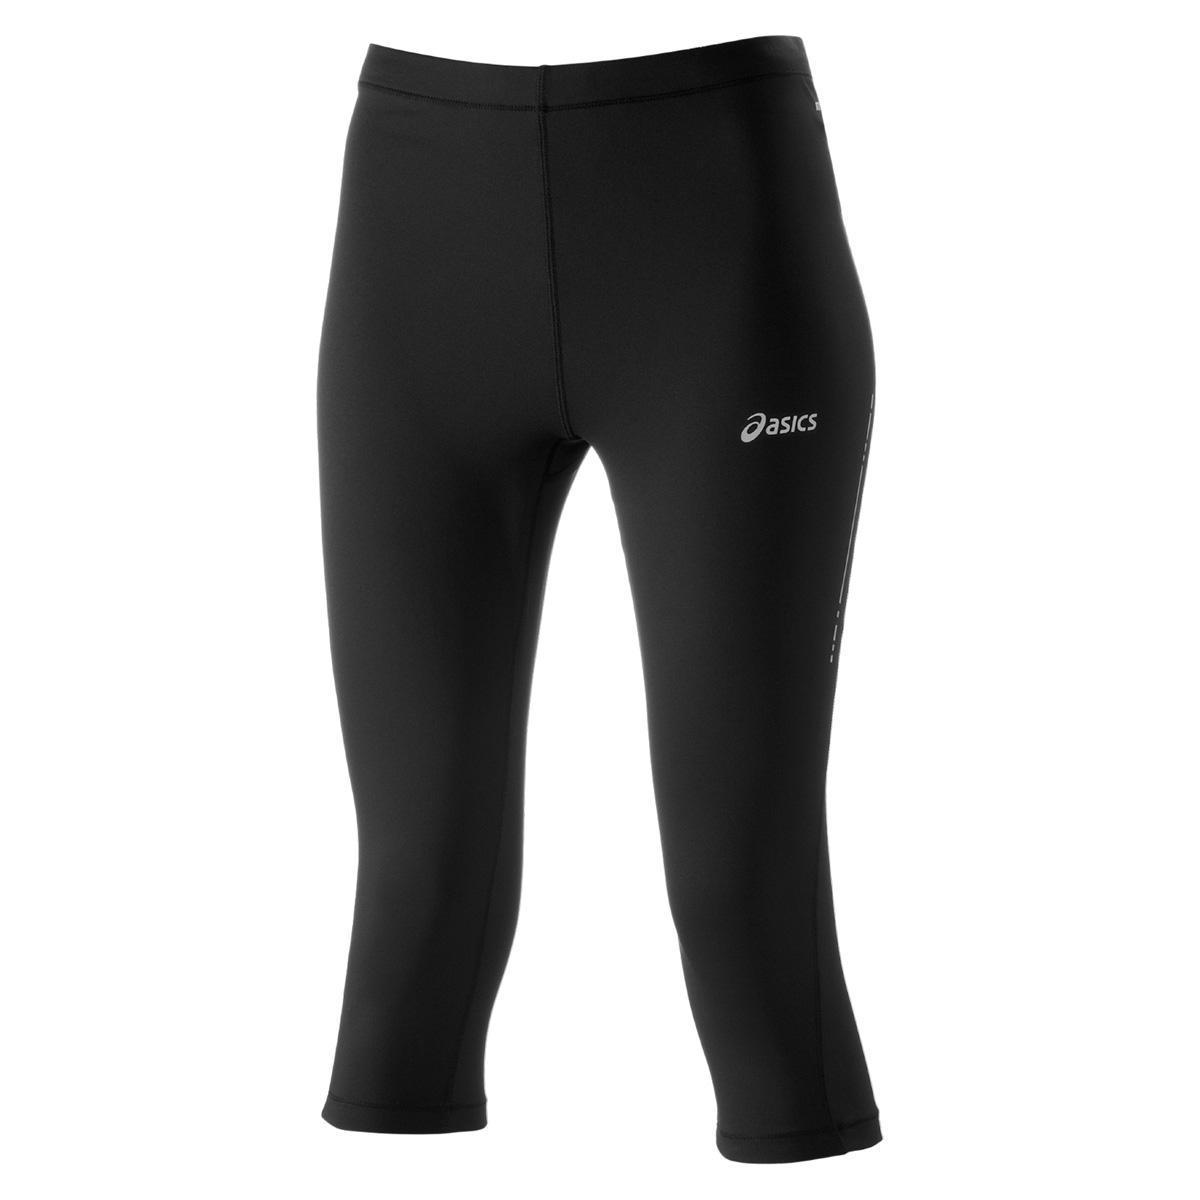 asics tights - performance black damen